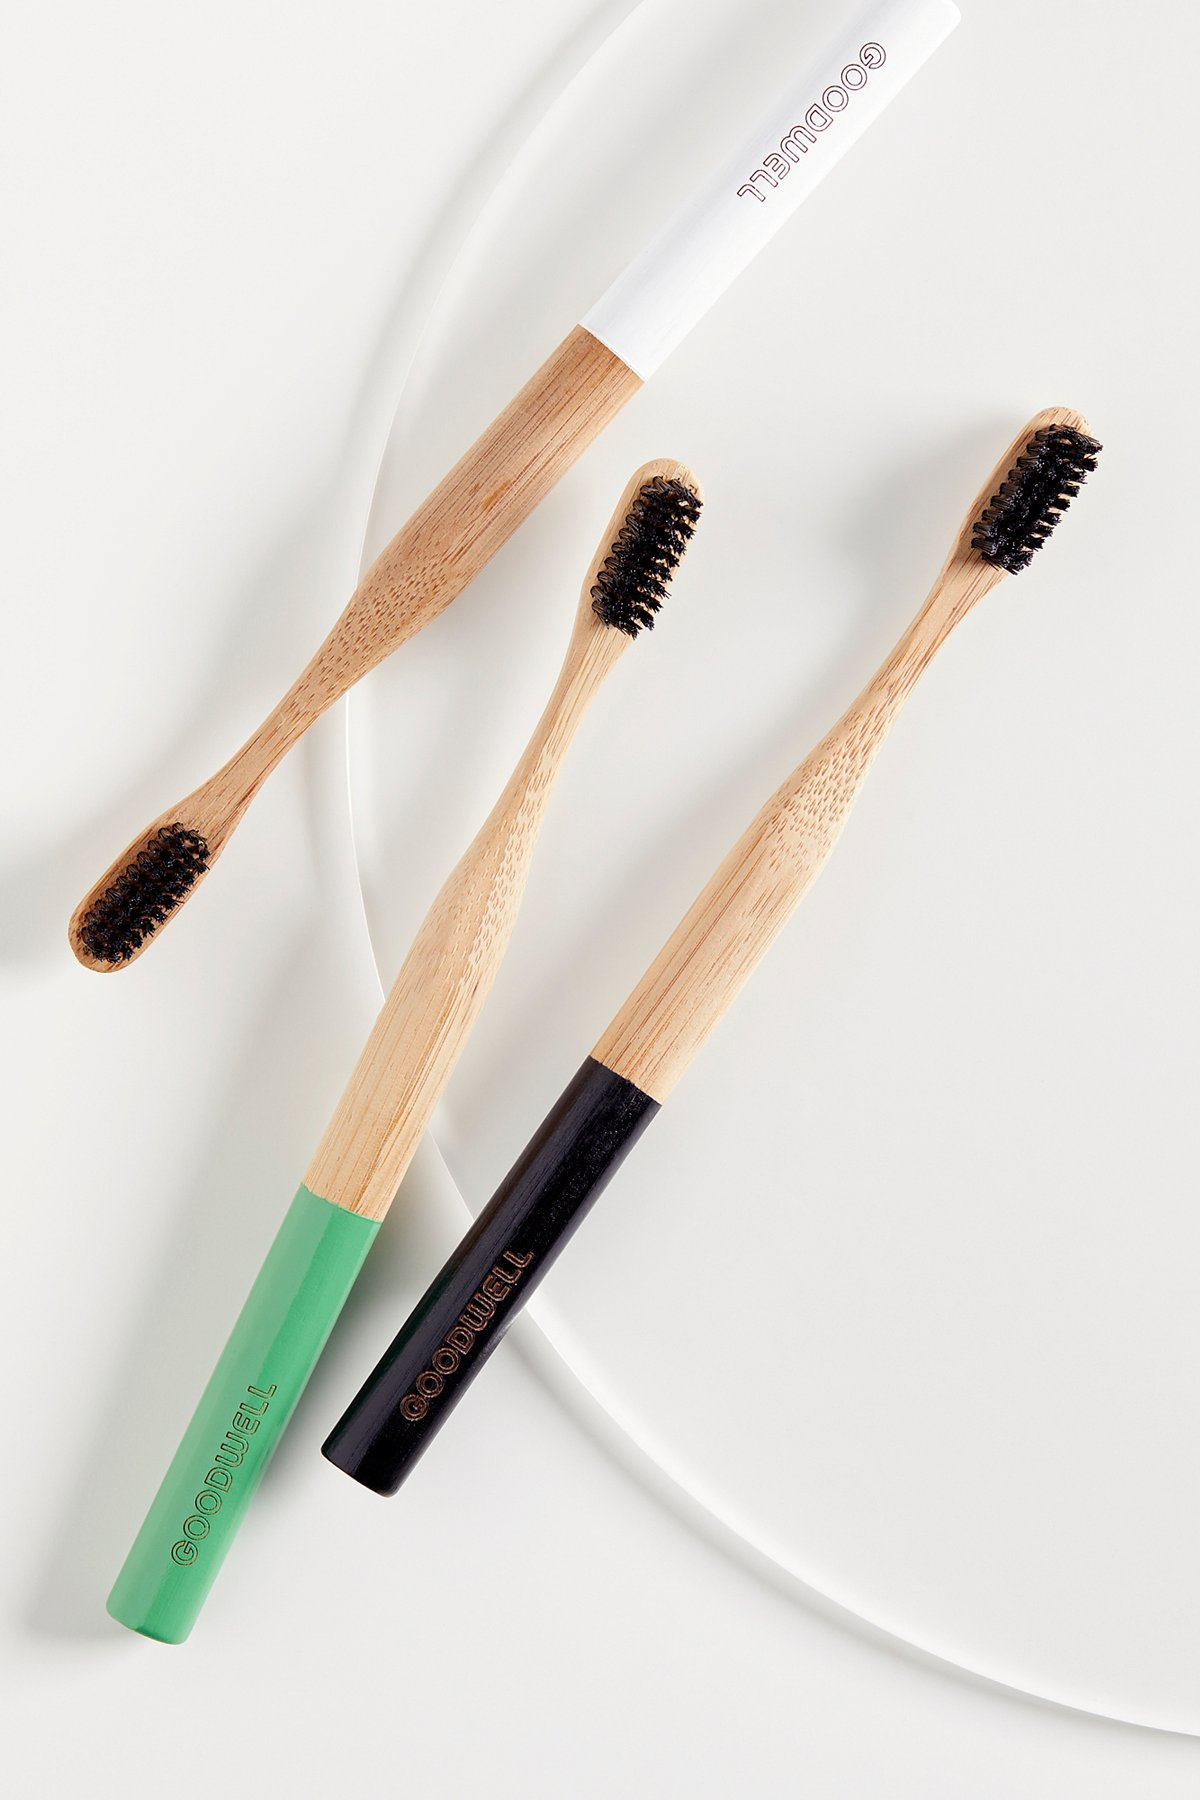 Bamboo + Binchotan Toothbrush